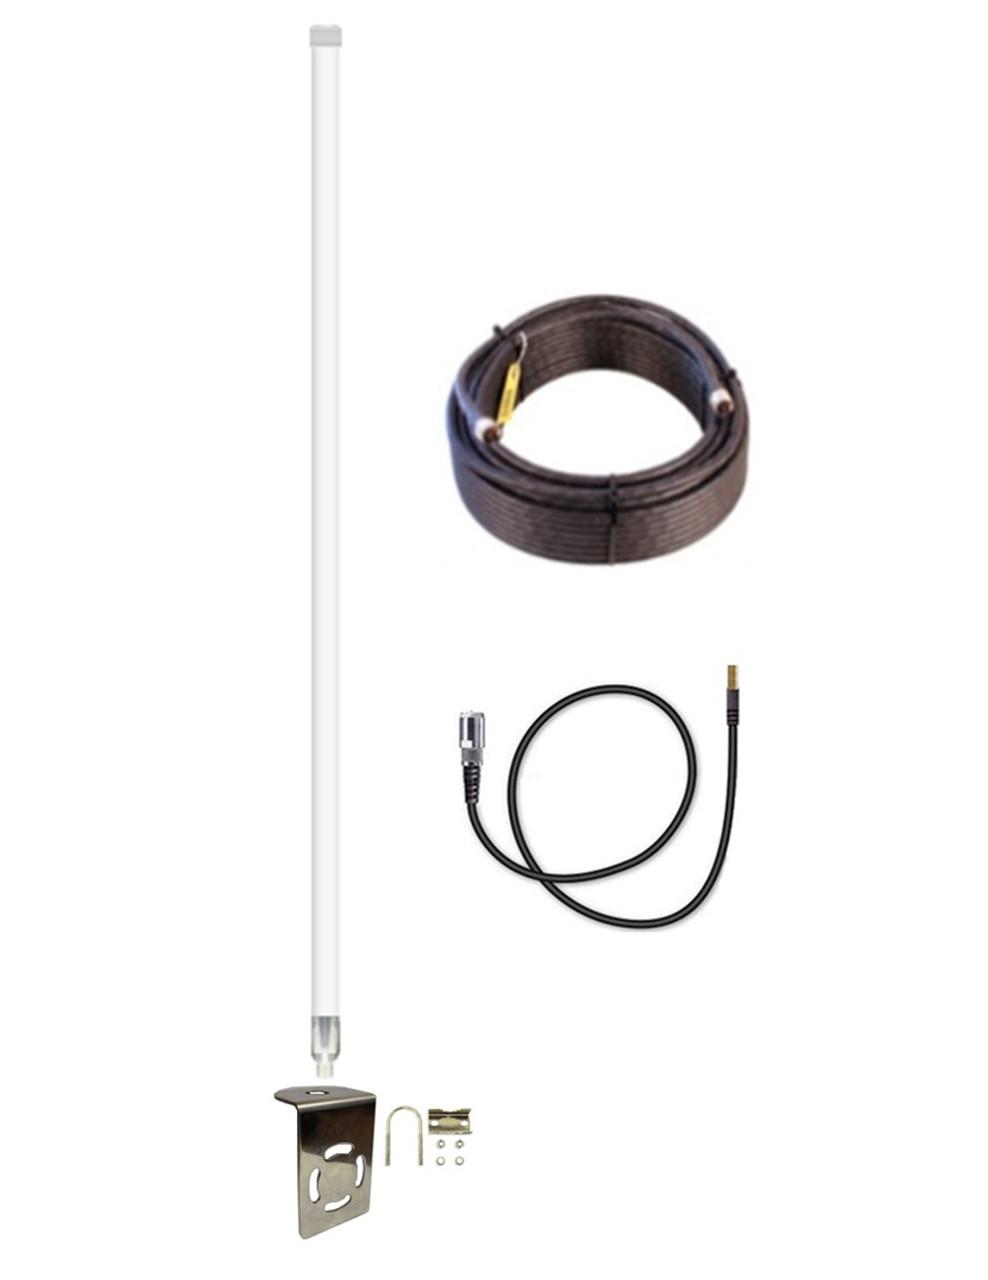 12dB Fiberglass 4G 5G LTE XLTE Antenna Kit AT&T ZTE Velocity 2 MF985 Mobile Hotspot w/ Cable Length Options